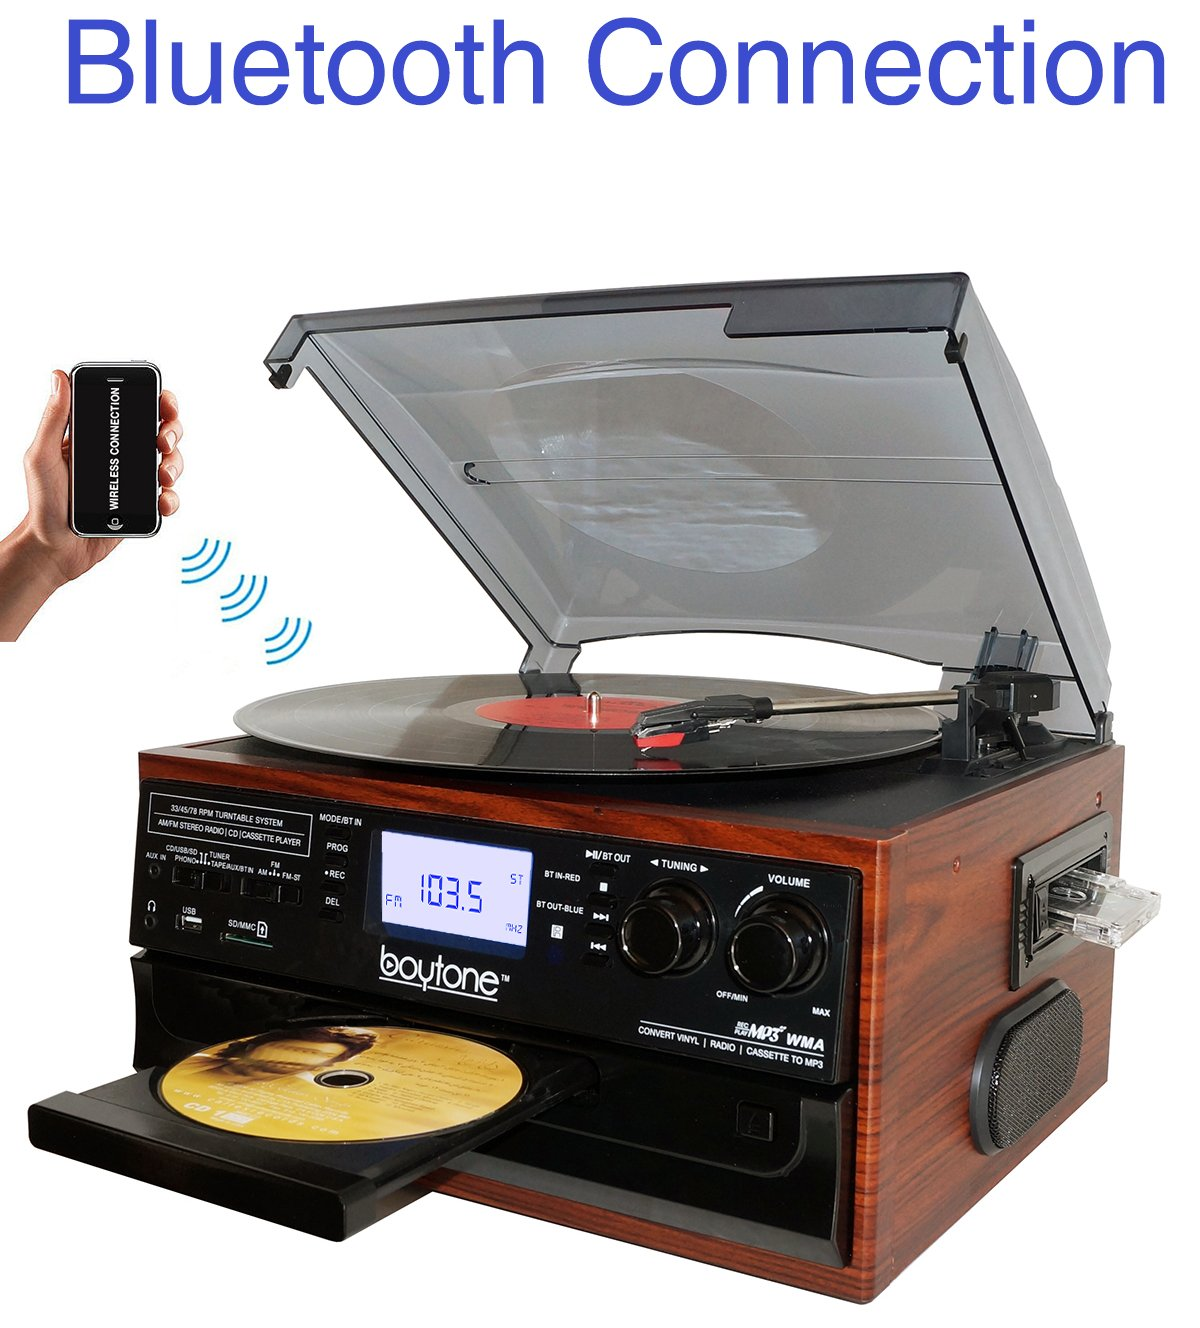 Boytone BT 22M Bluetooth Turntable Cassette